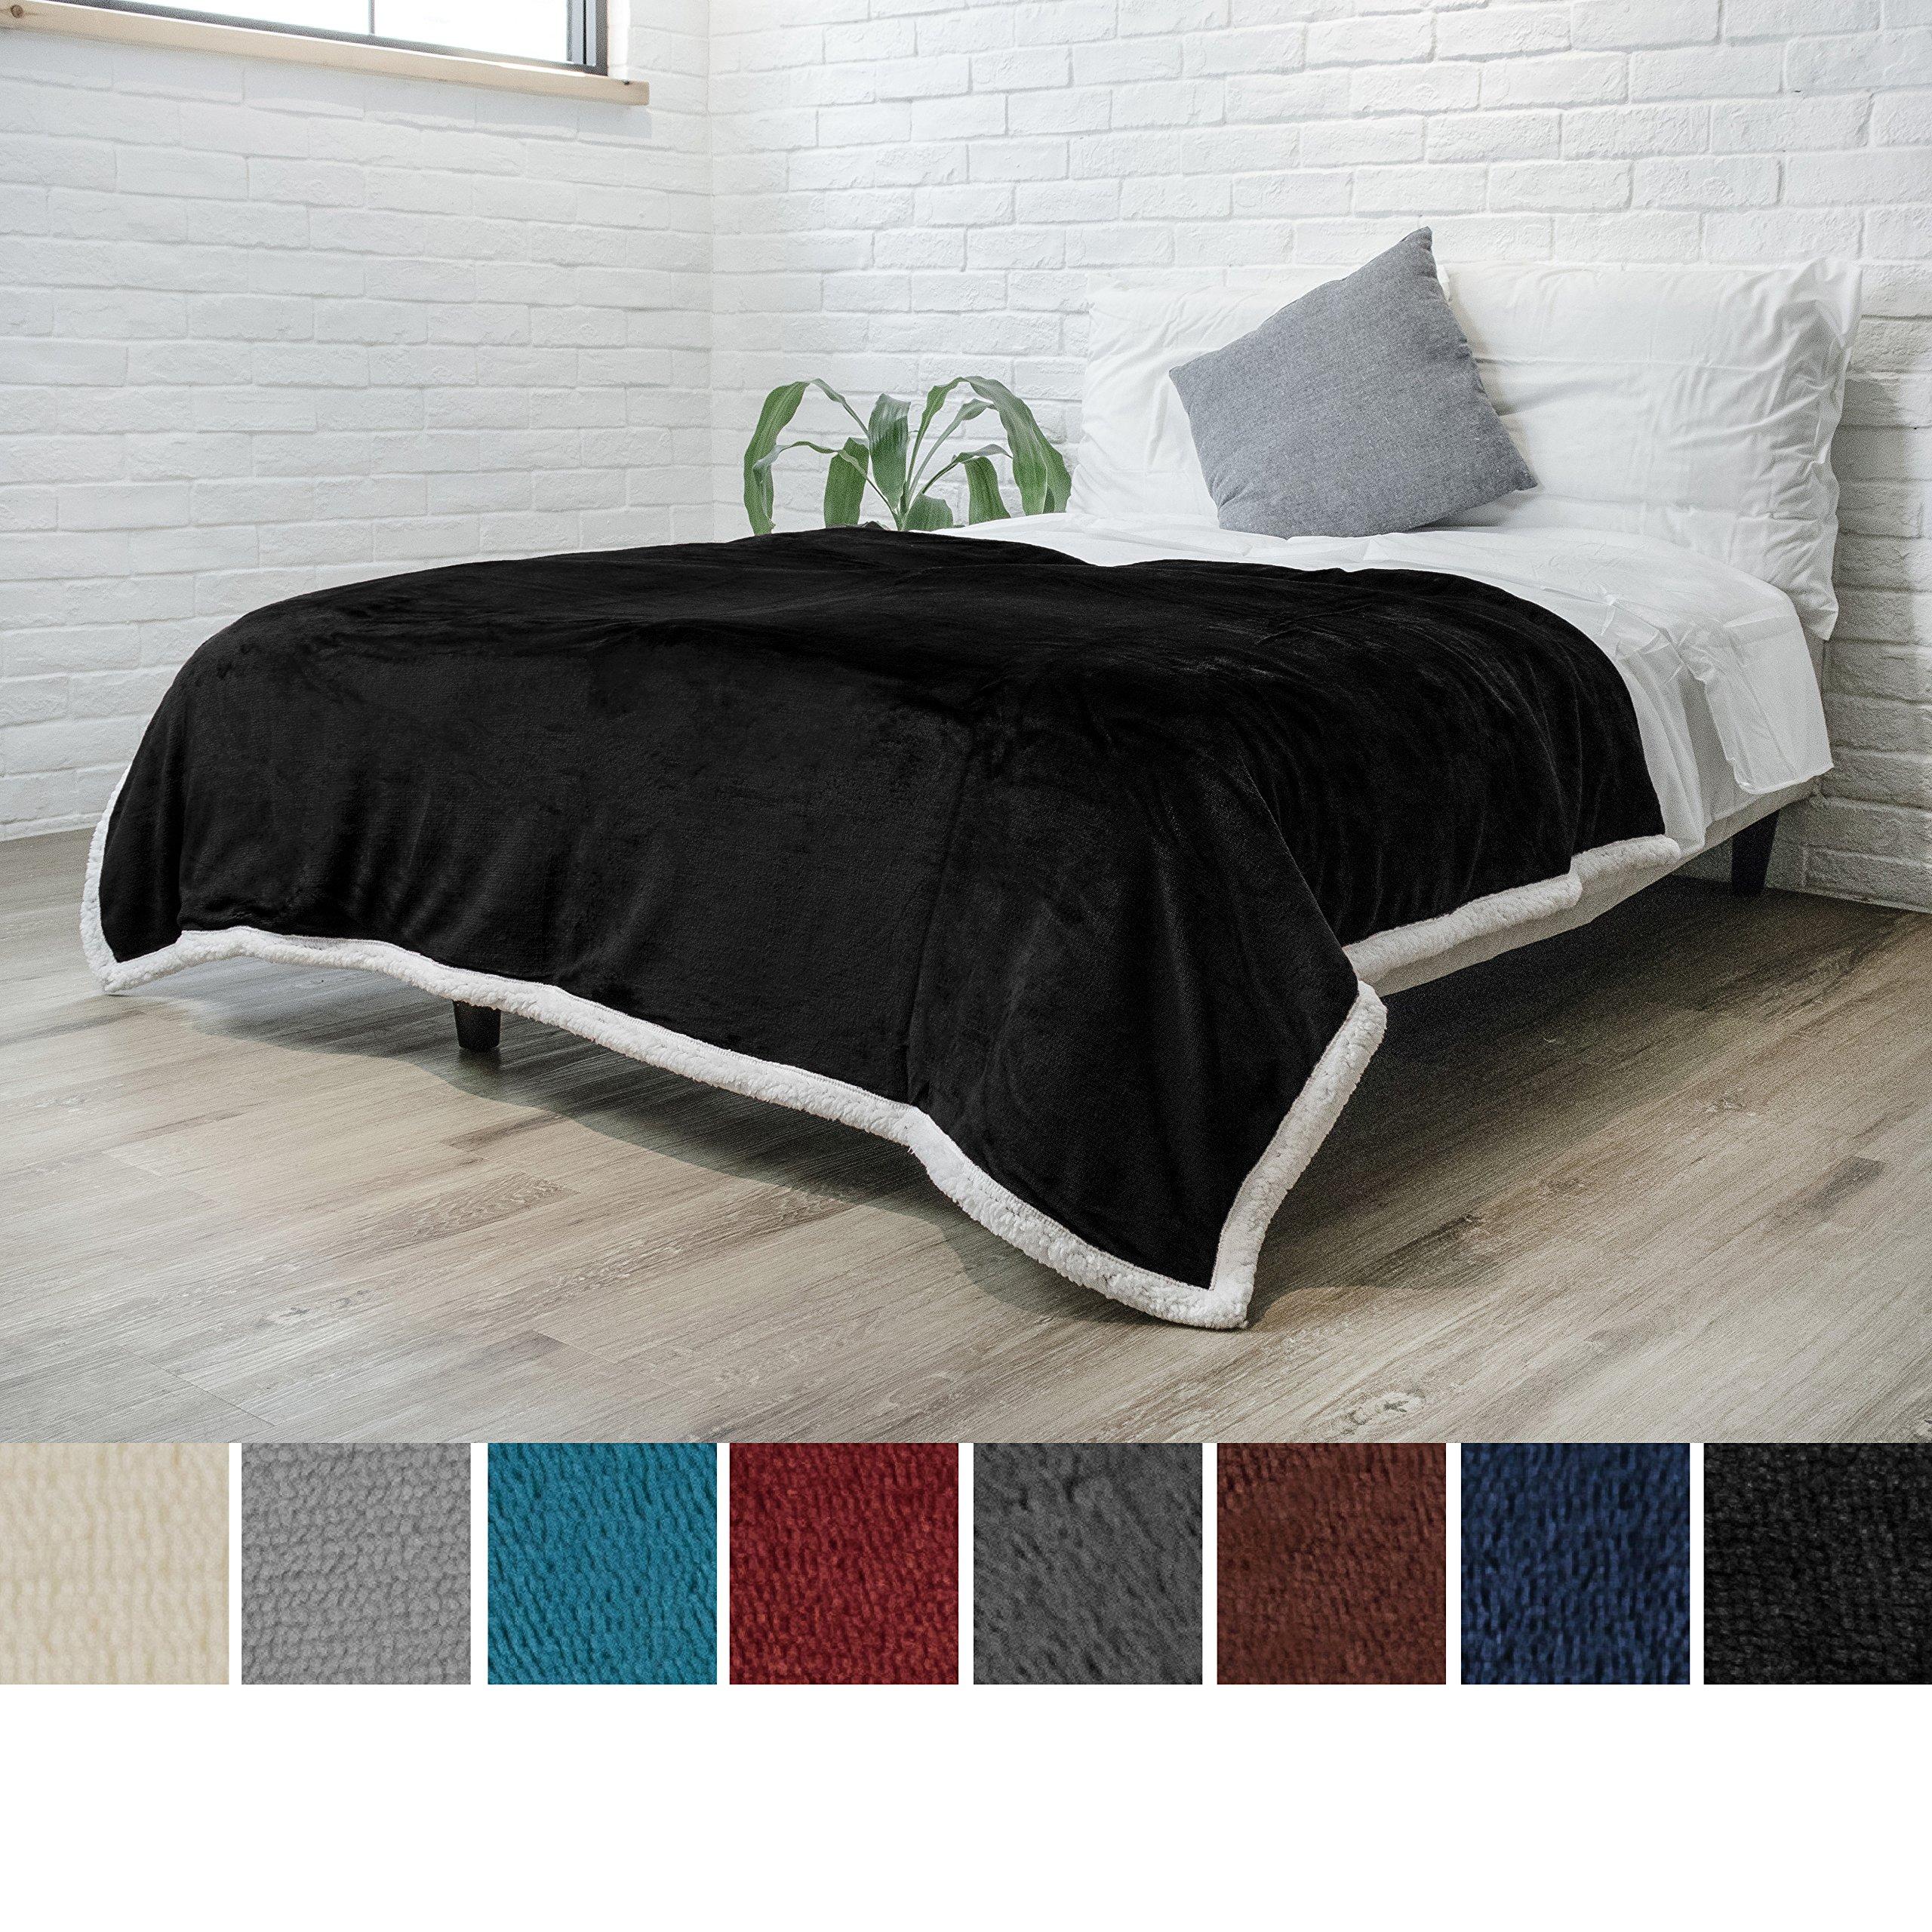 PAVILIA Premium Sherpa Fleece Blanket Twin Size   Soft, Plush, Fuzzy Black Throw   Reversible Warm Cozy Microfiber Solid Bed Blanket (Black, 60x80 Inches)